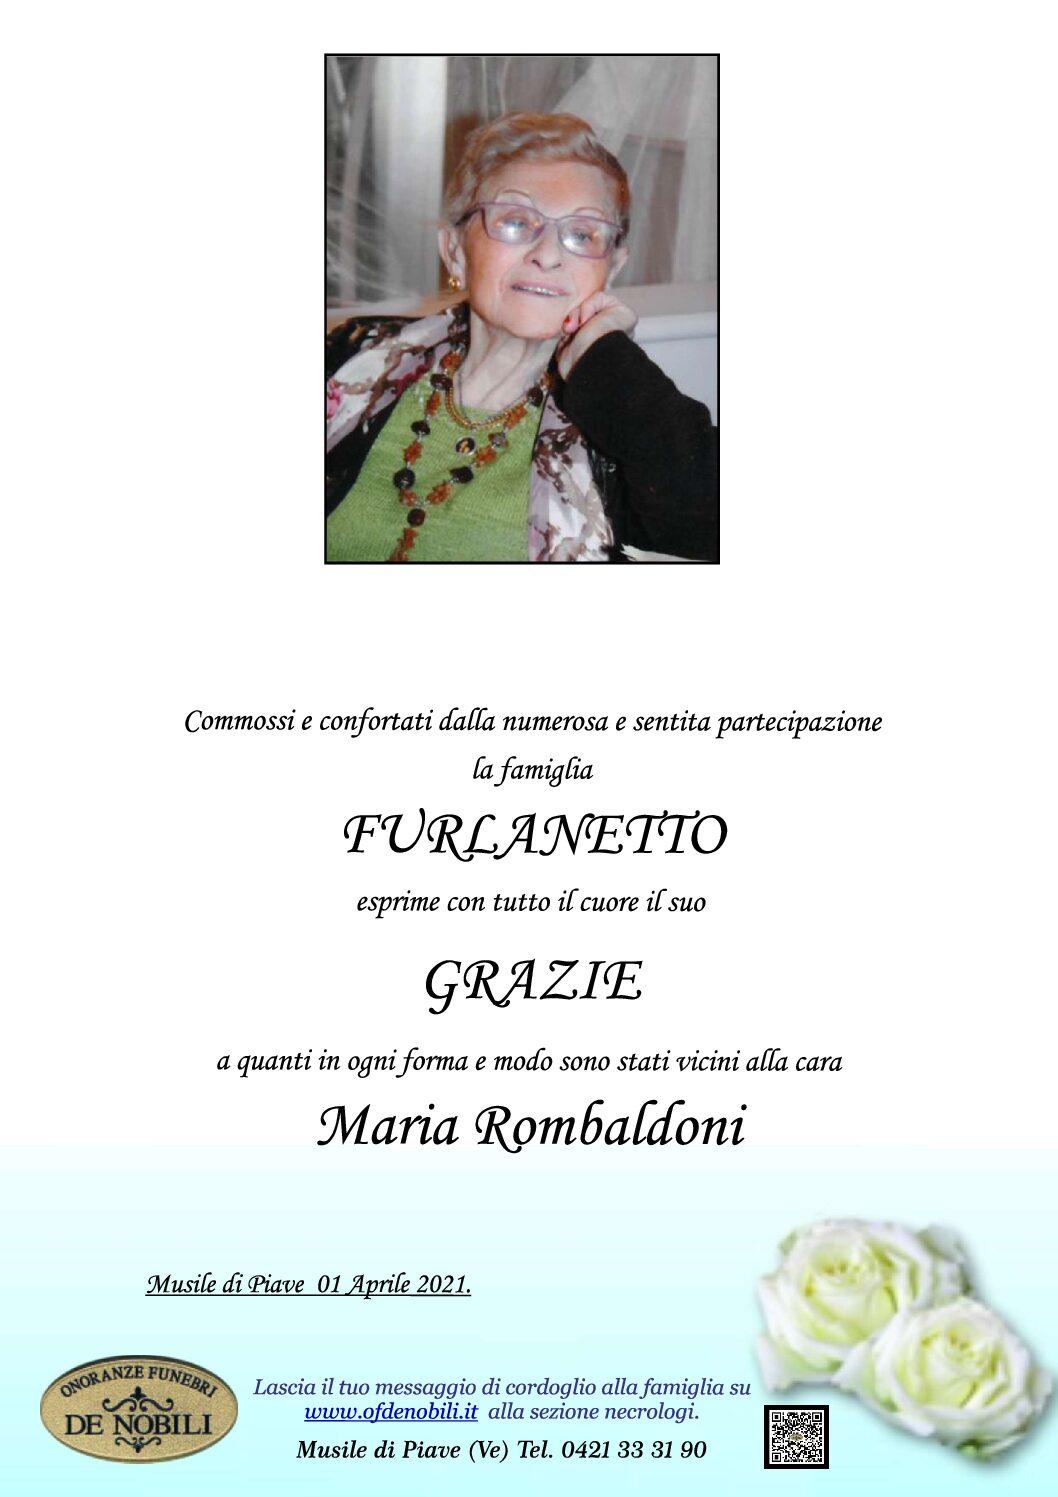 MARIA ROMBARDONI